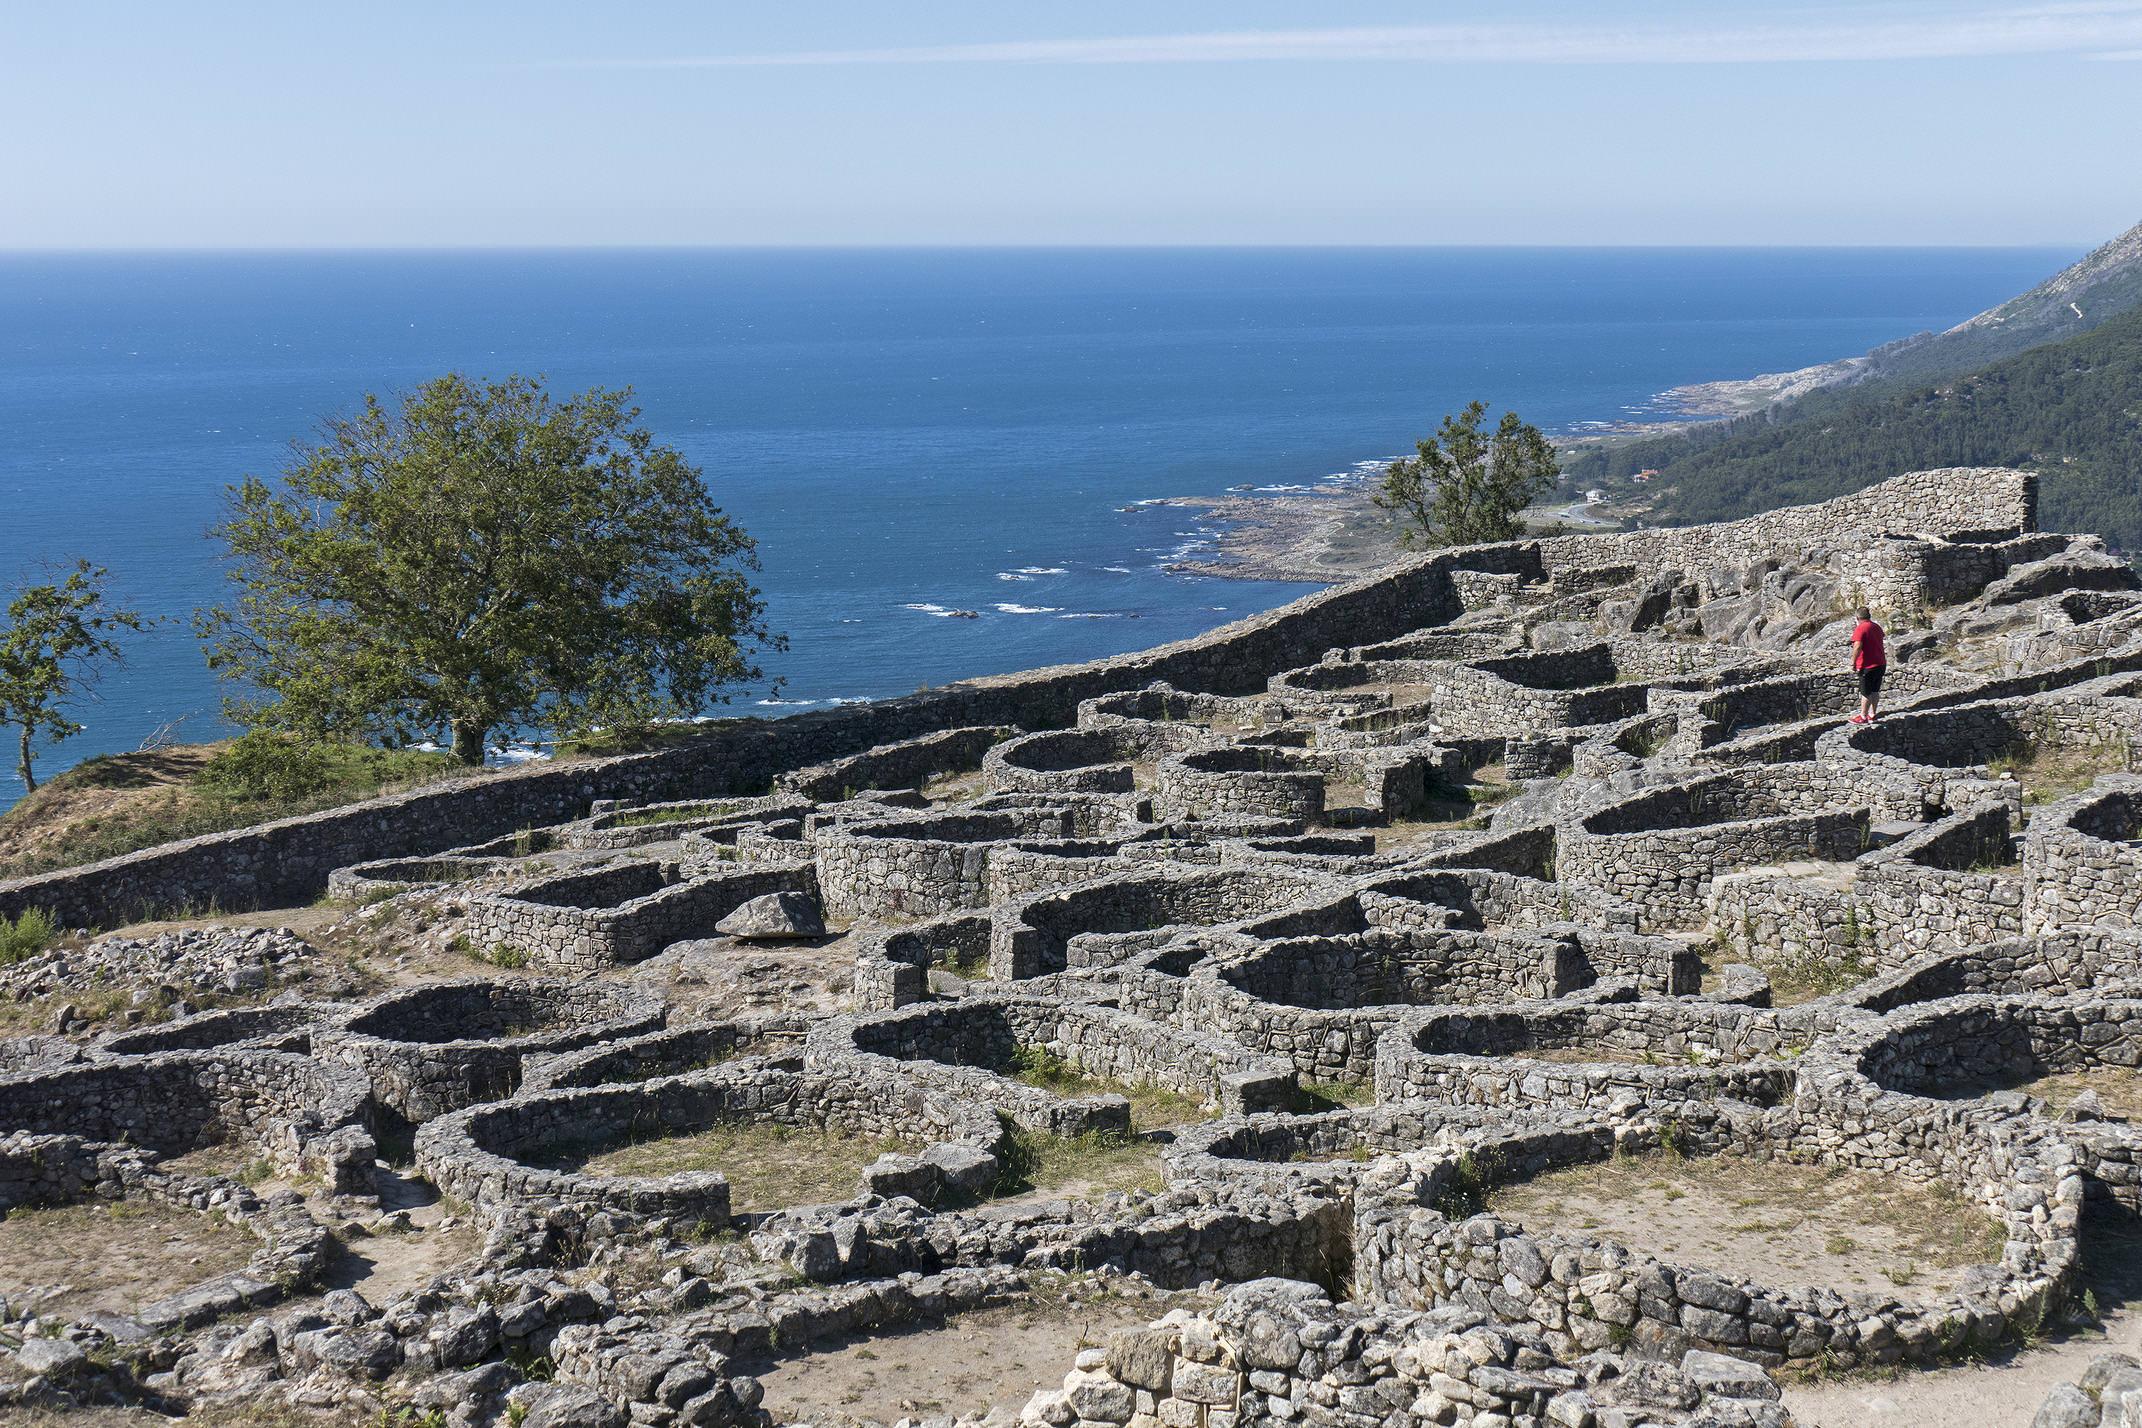 Spain galicia aguarda minho santa tecla iron age c diego pura